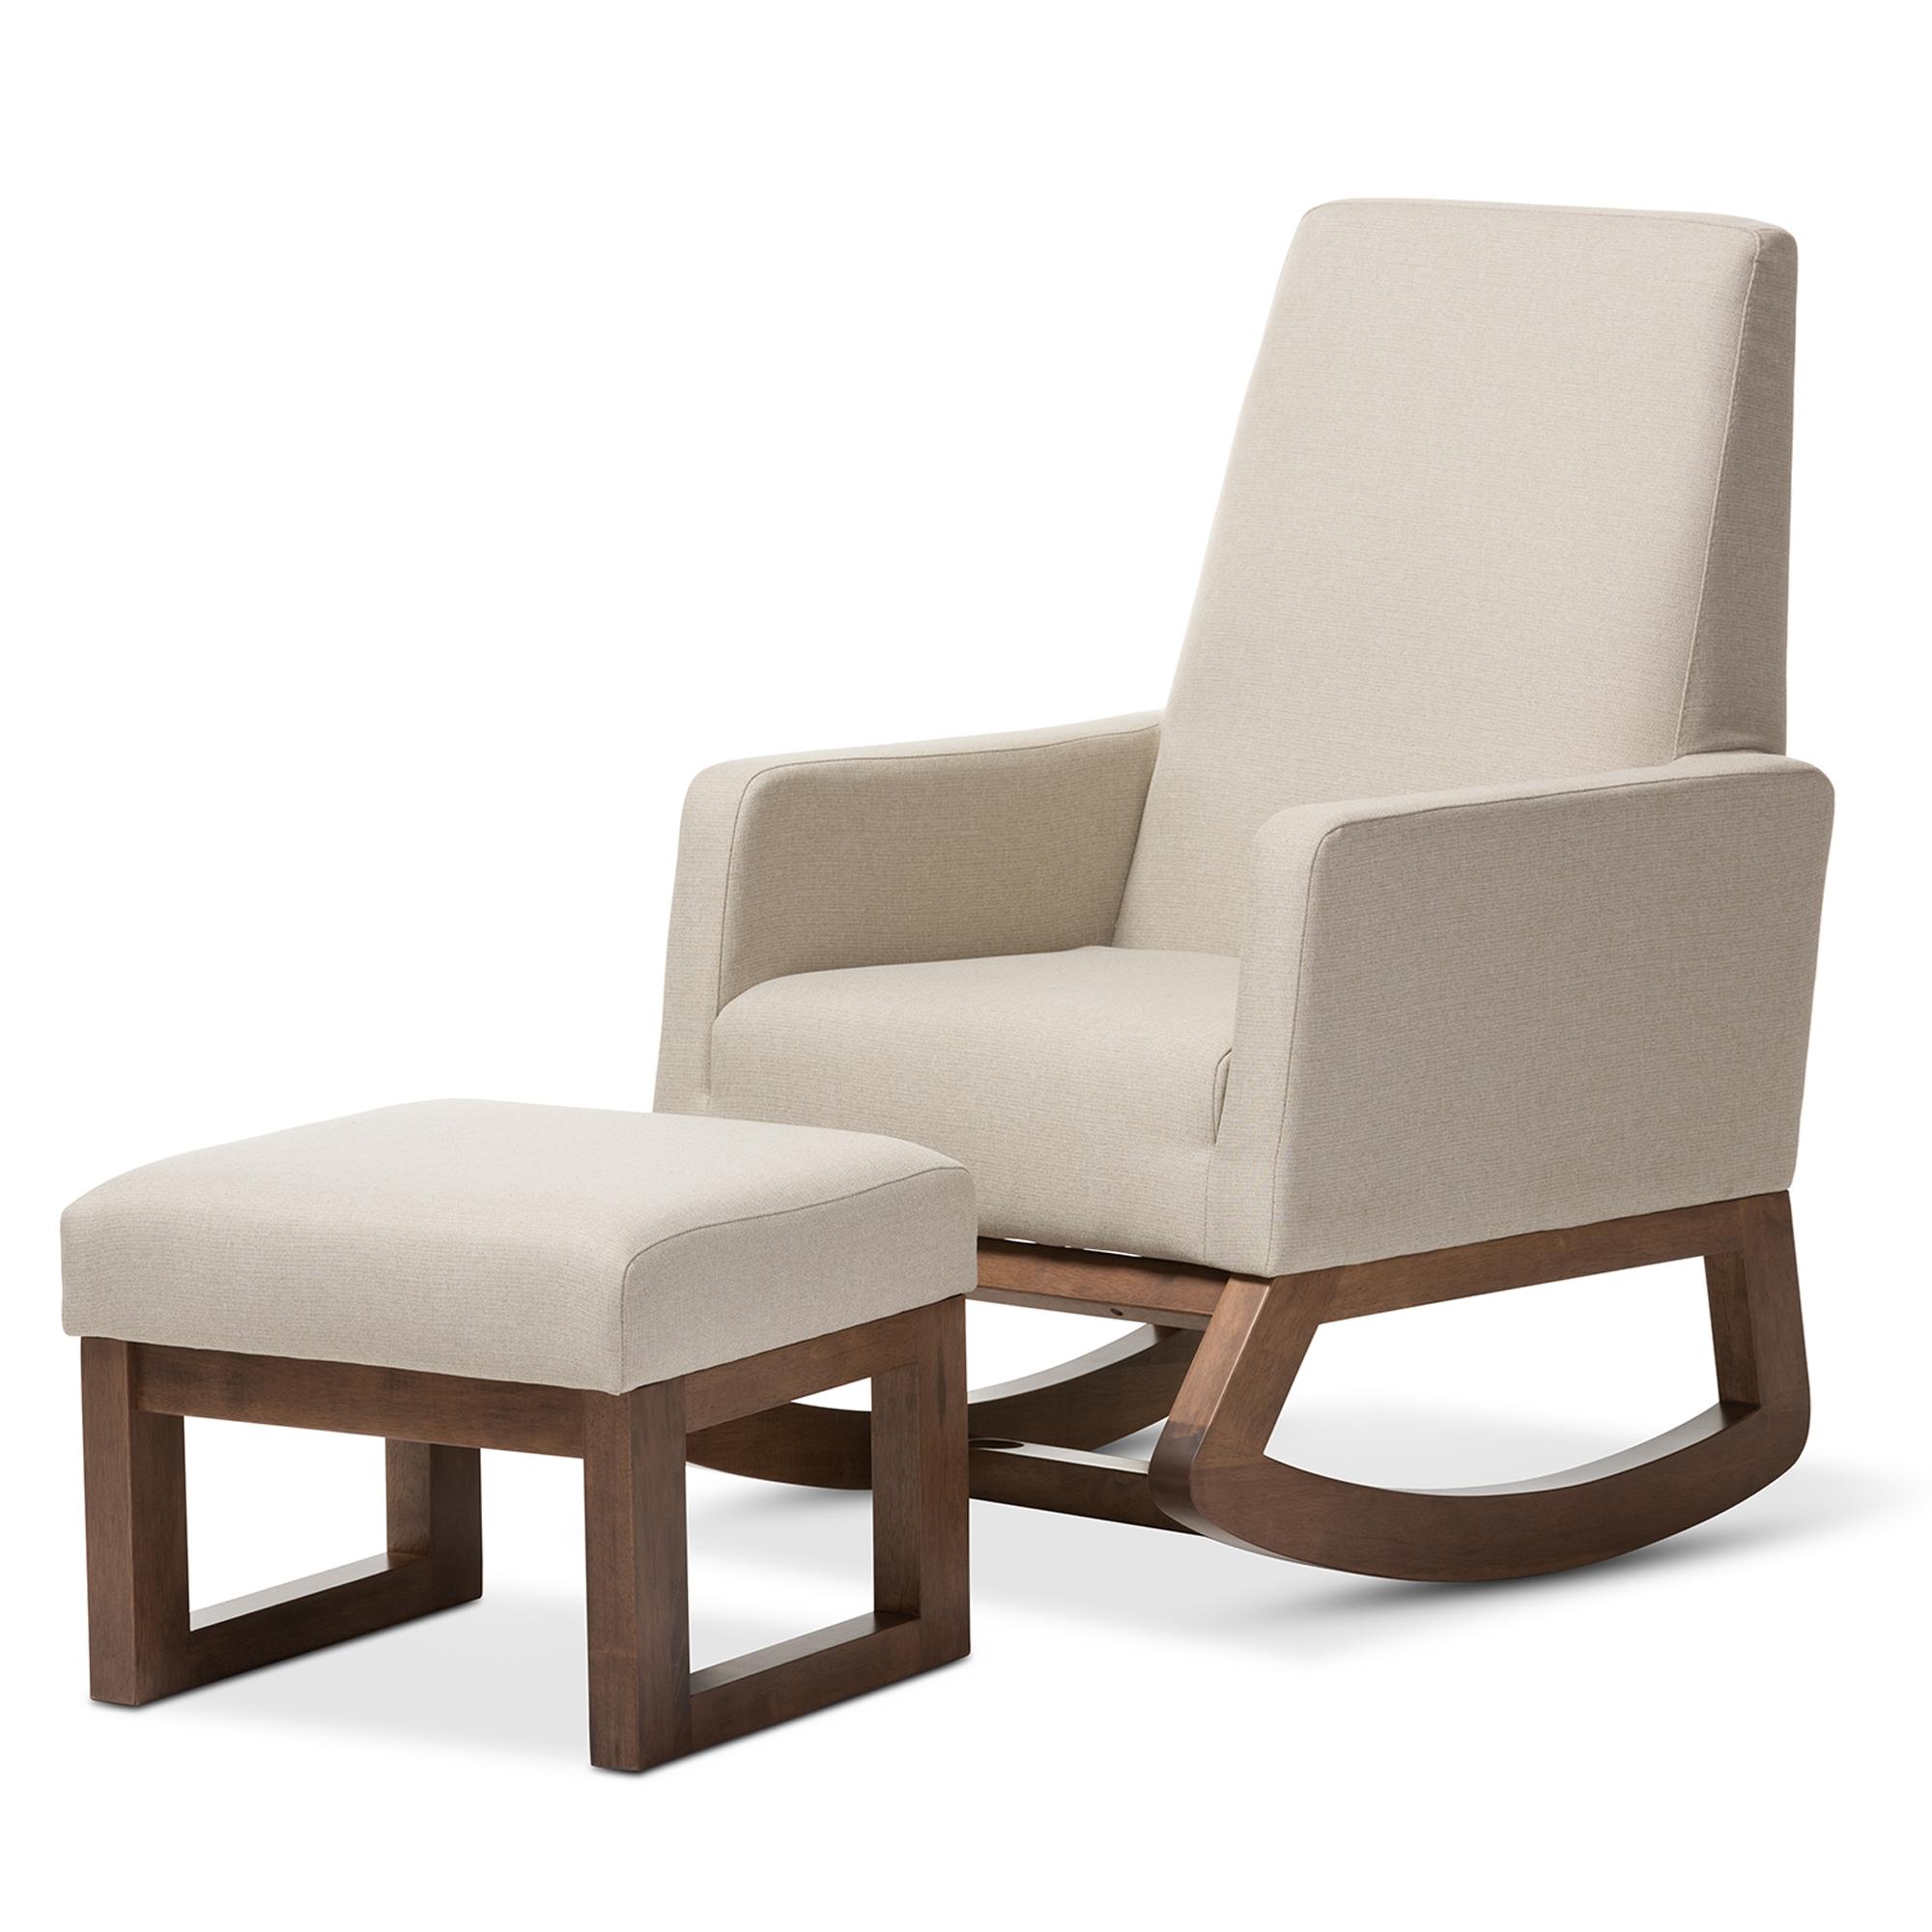 baxton studio iona mid century retro modern. Baxton Studio Rocking Chair. 25th February 2017. Posted By Admin. Iona Mid Century Retro Modern I